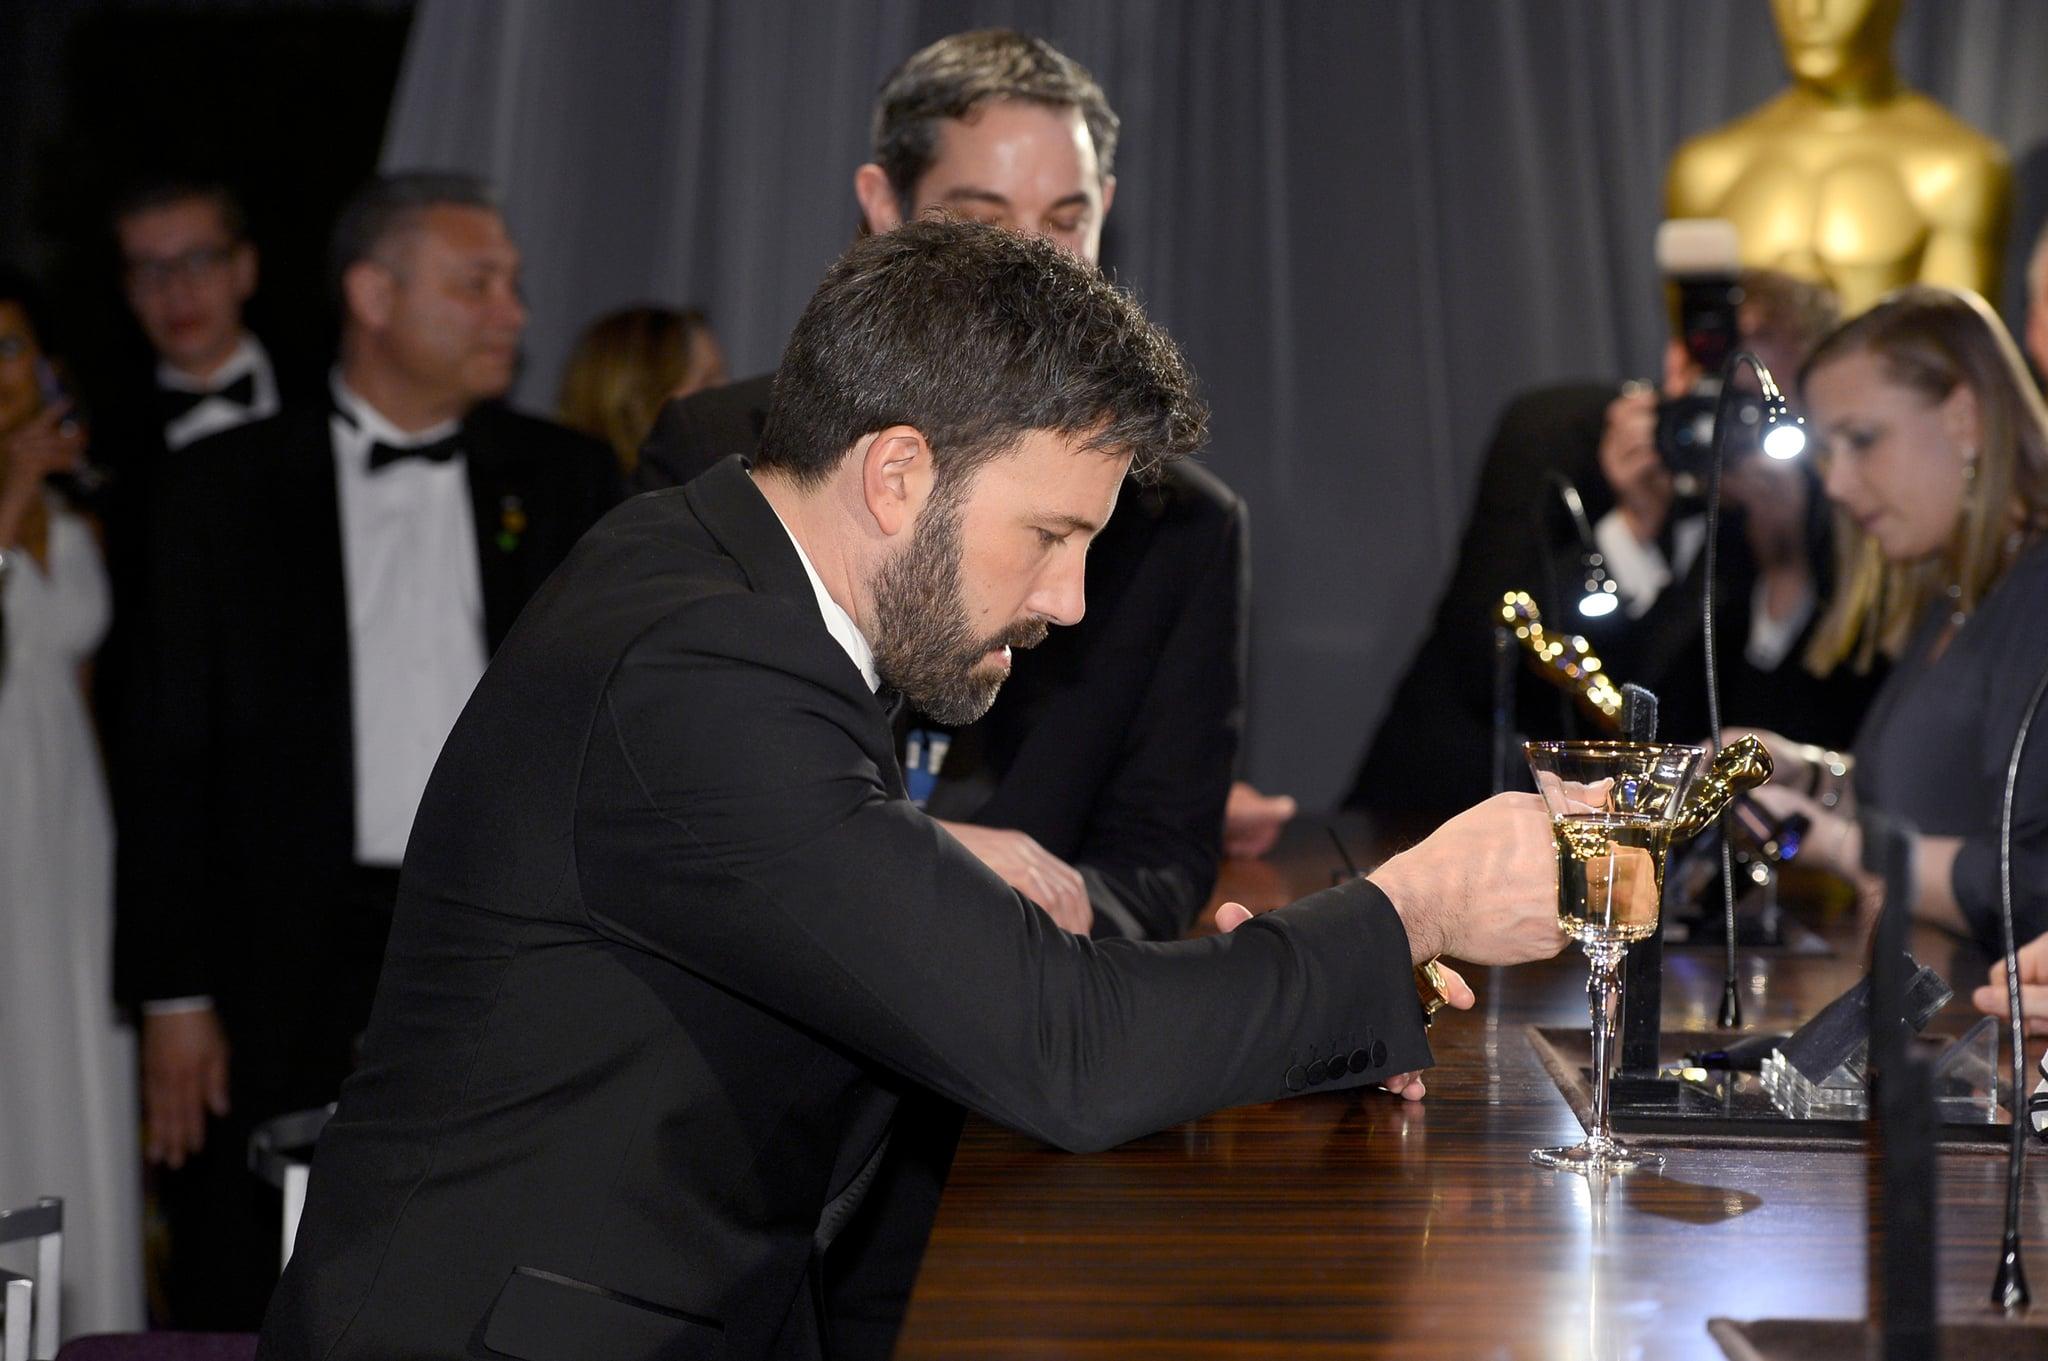 Ben Affleck studied his Oscar at the Governors Ball.